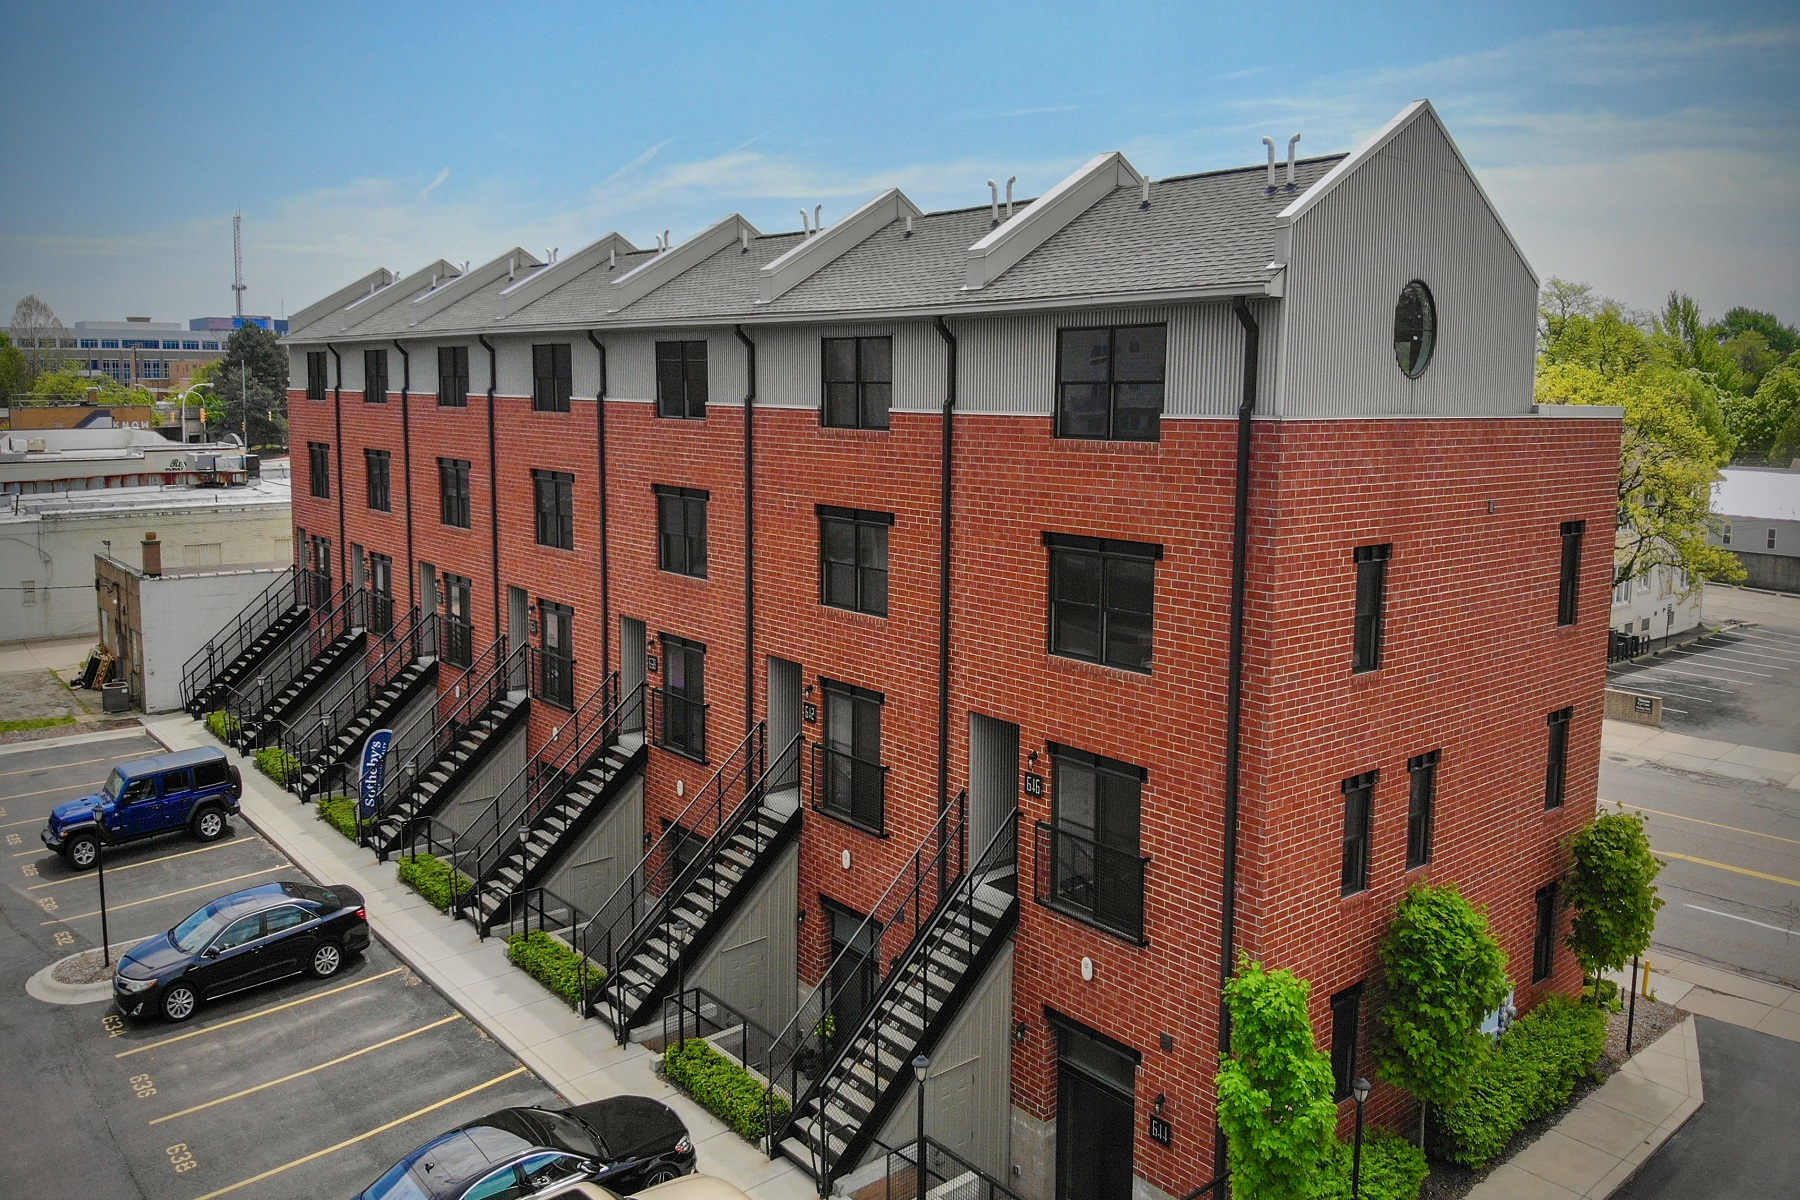 Condominiums 为 销售 在 Royal Oak 630 W Eleven Mile Road Unit #22 罗雅尔奥克, 密歇根州 48067 美国